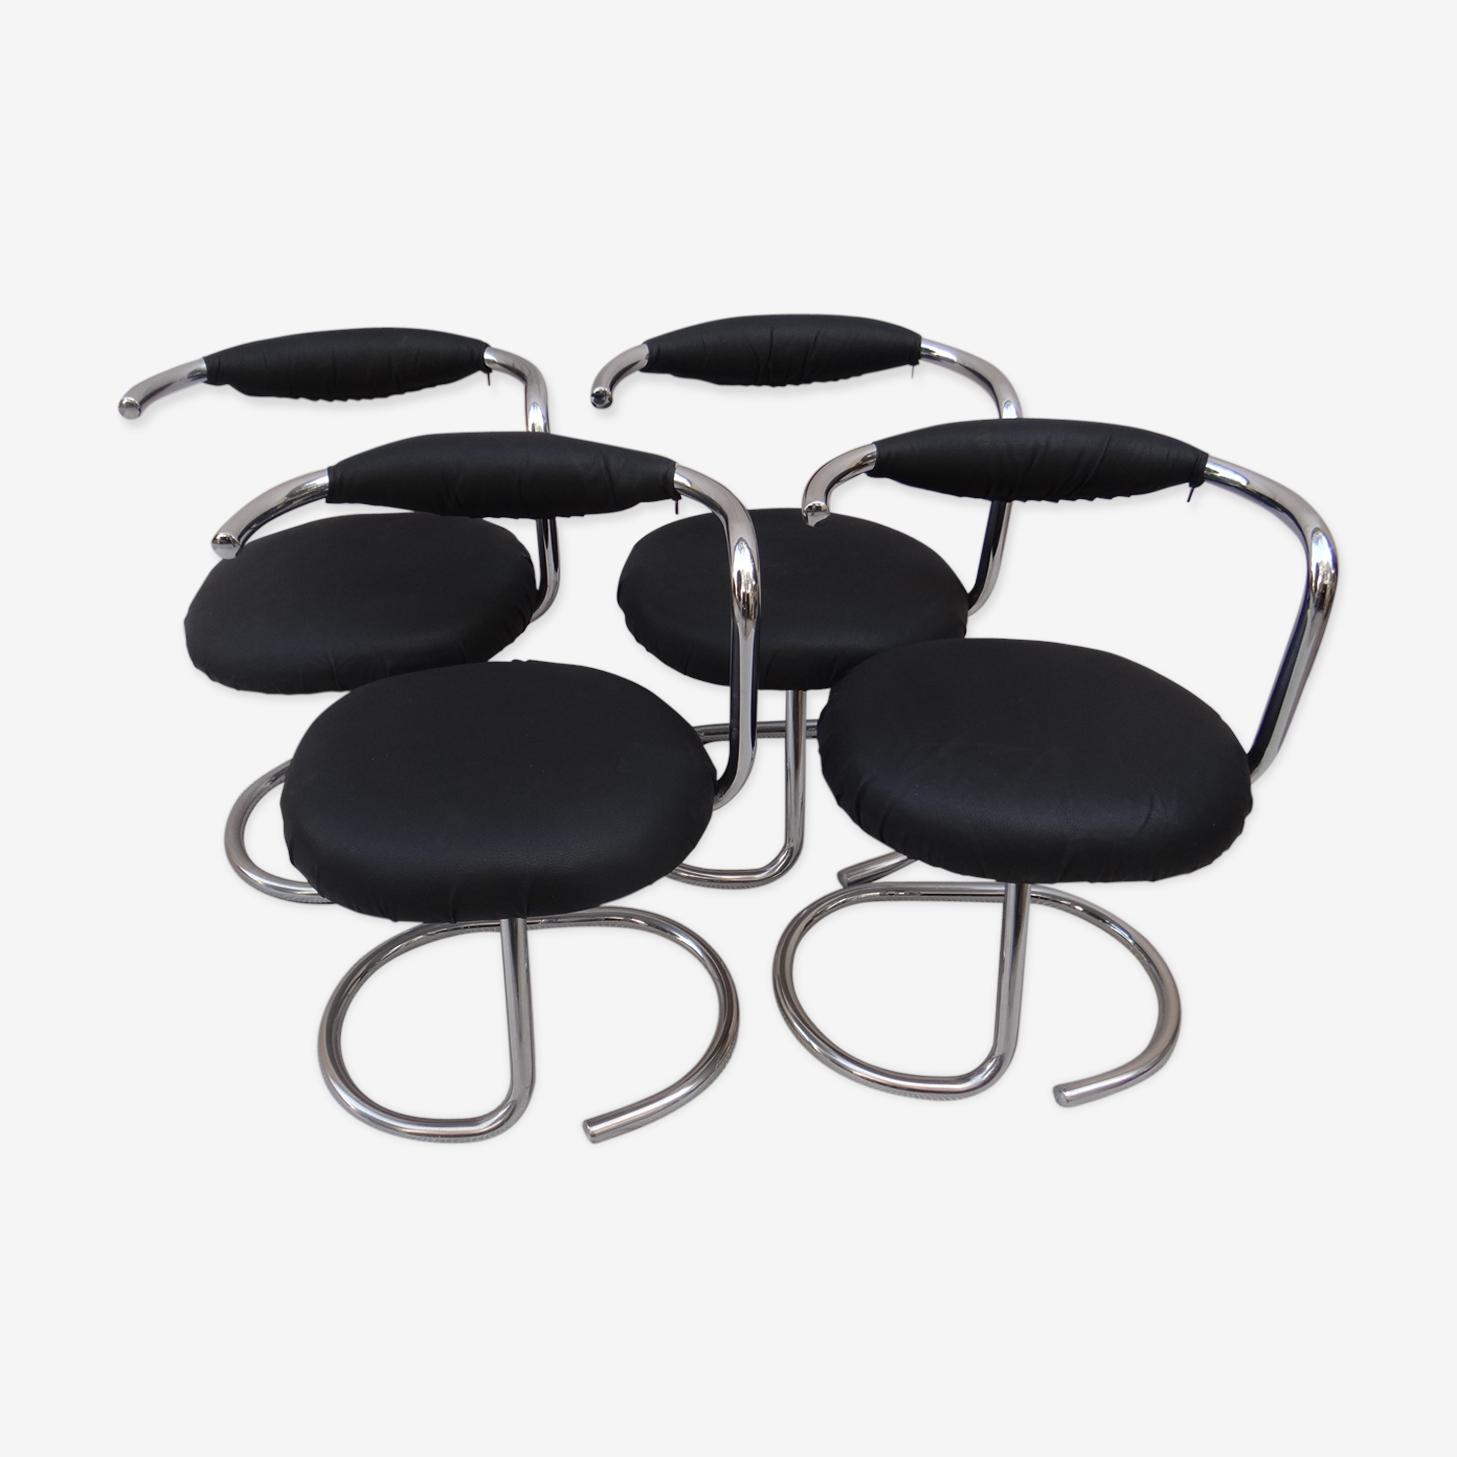 4 chaises Giorgo Stoppino 1970